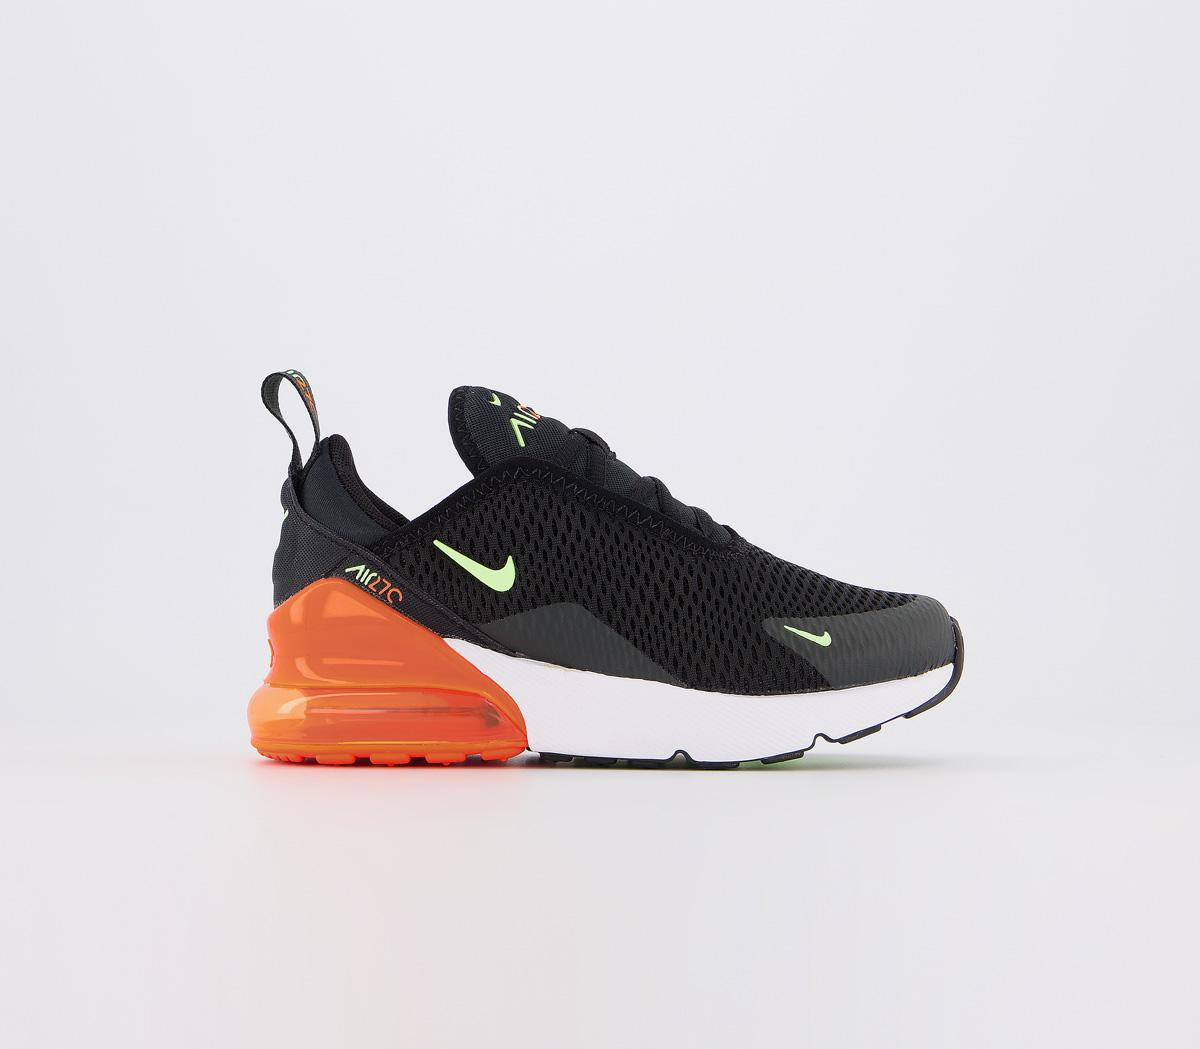 nike air max black green orange